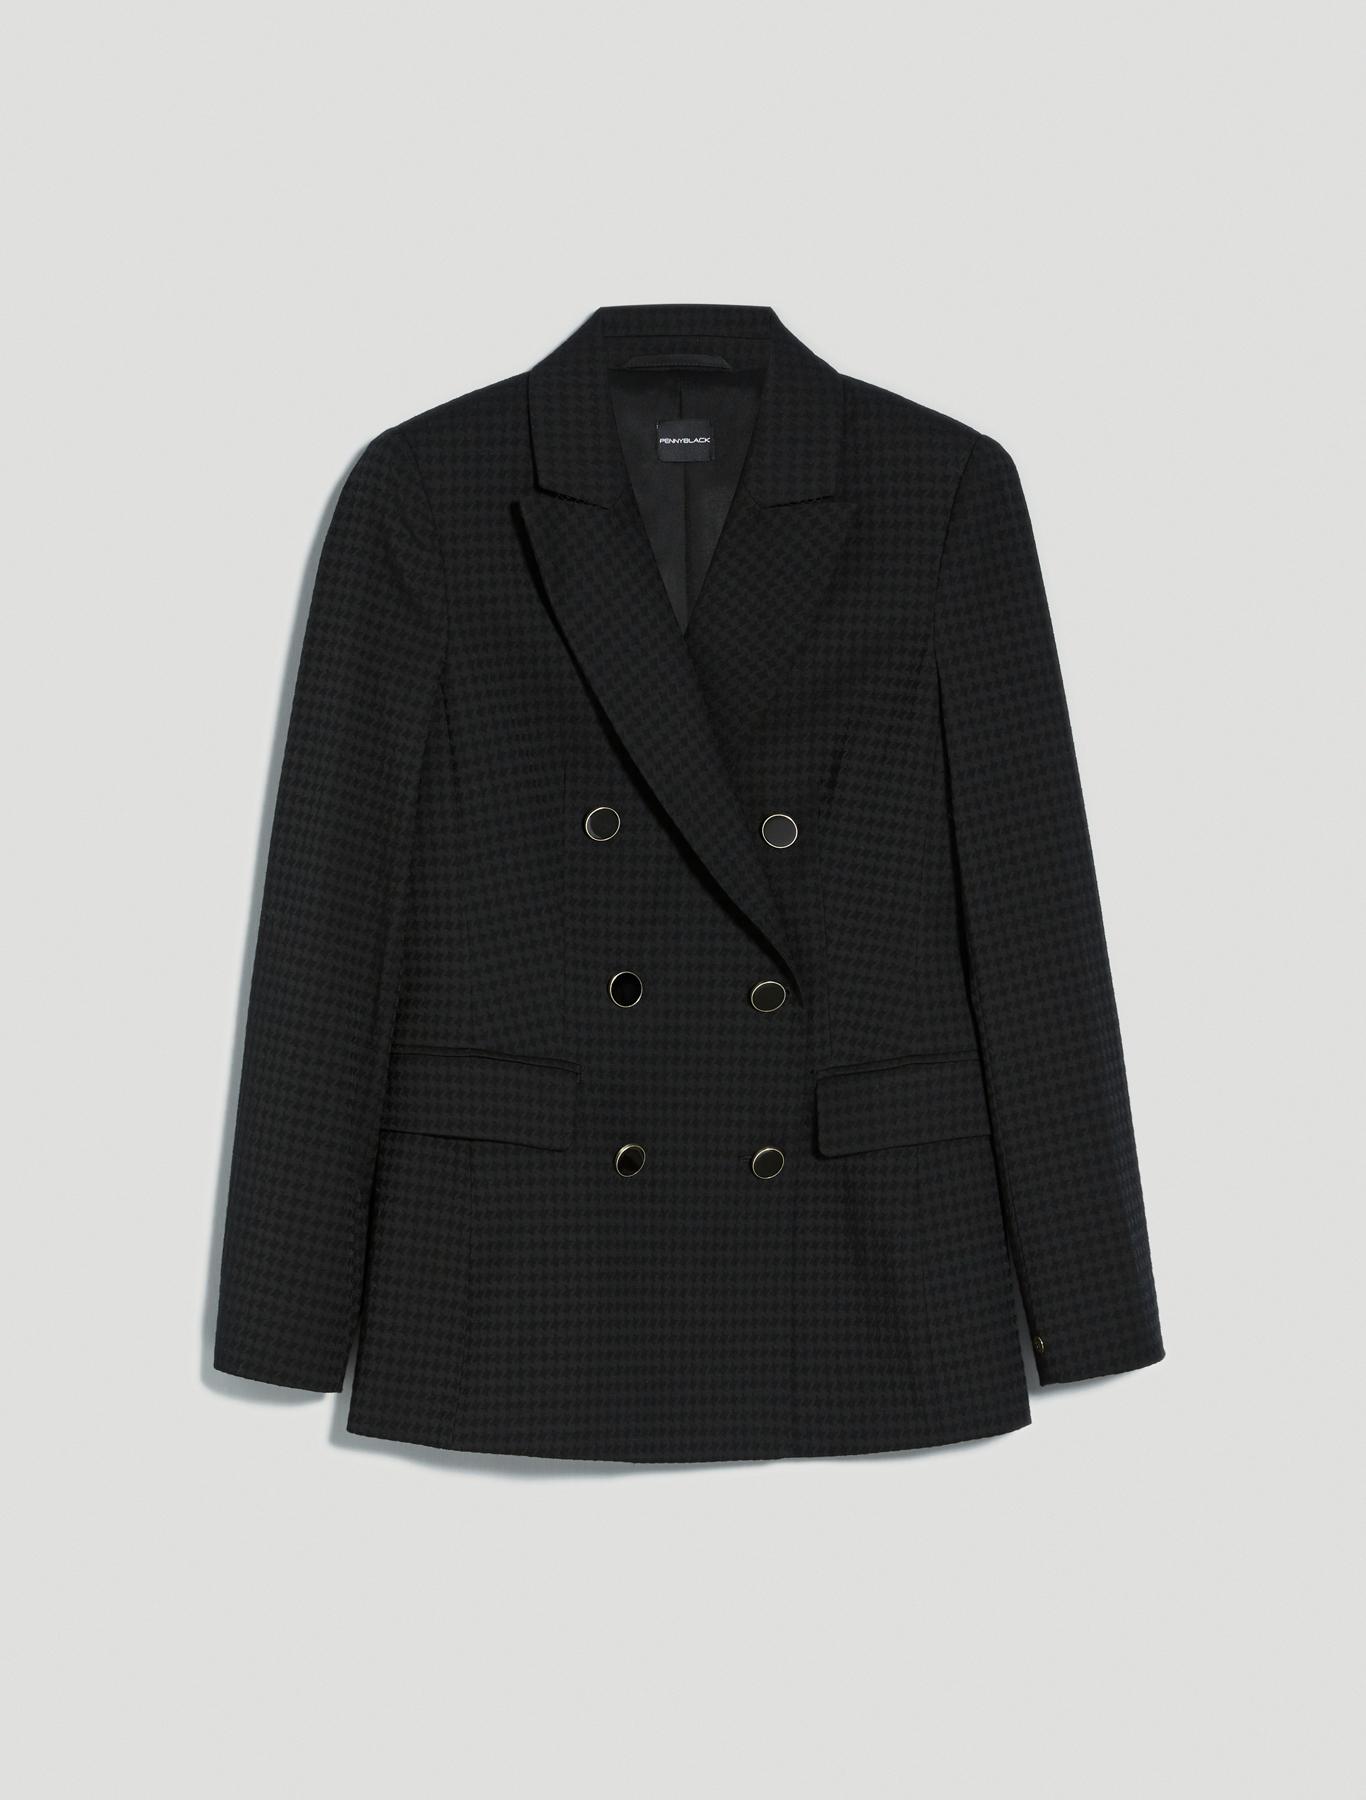 Houndstooth blazer - black - pennyblack